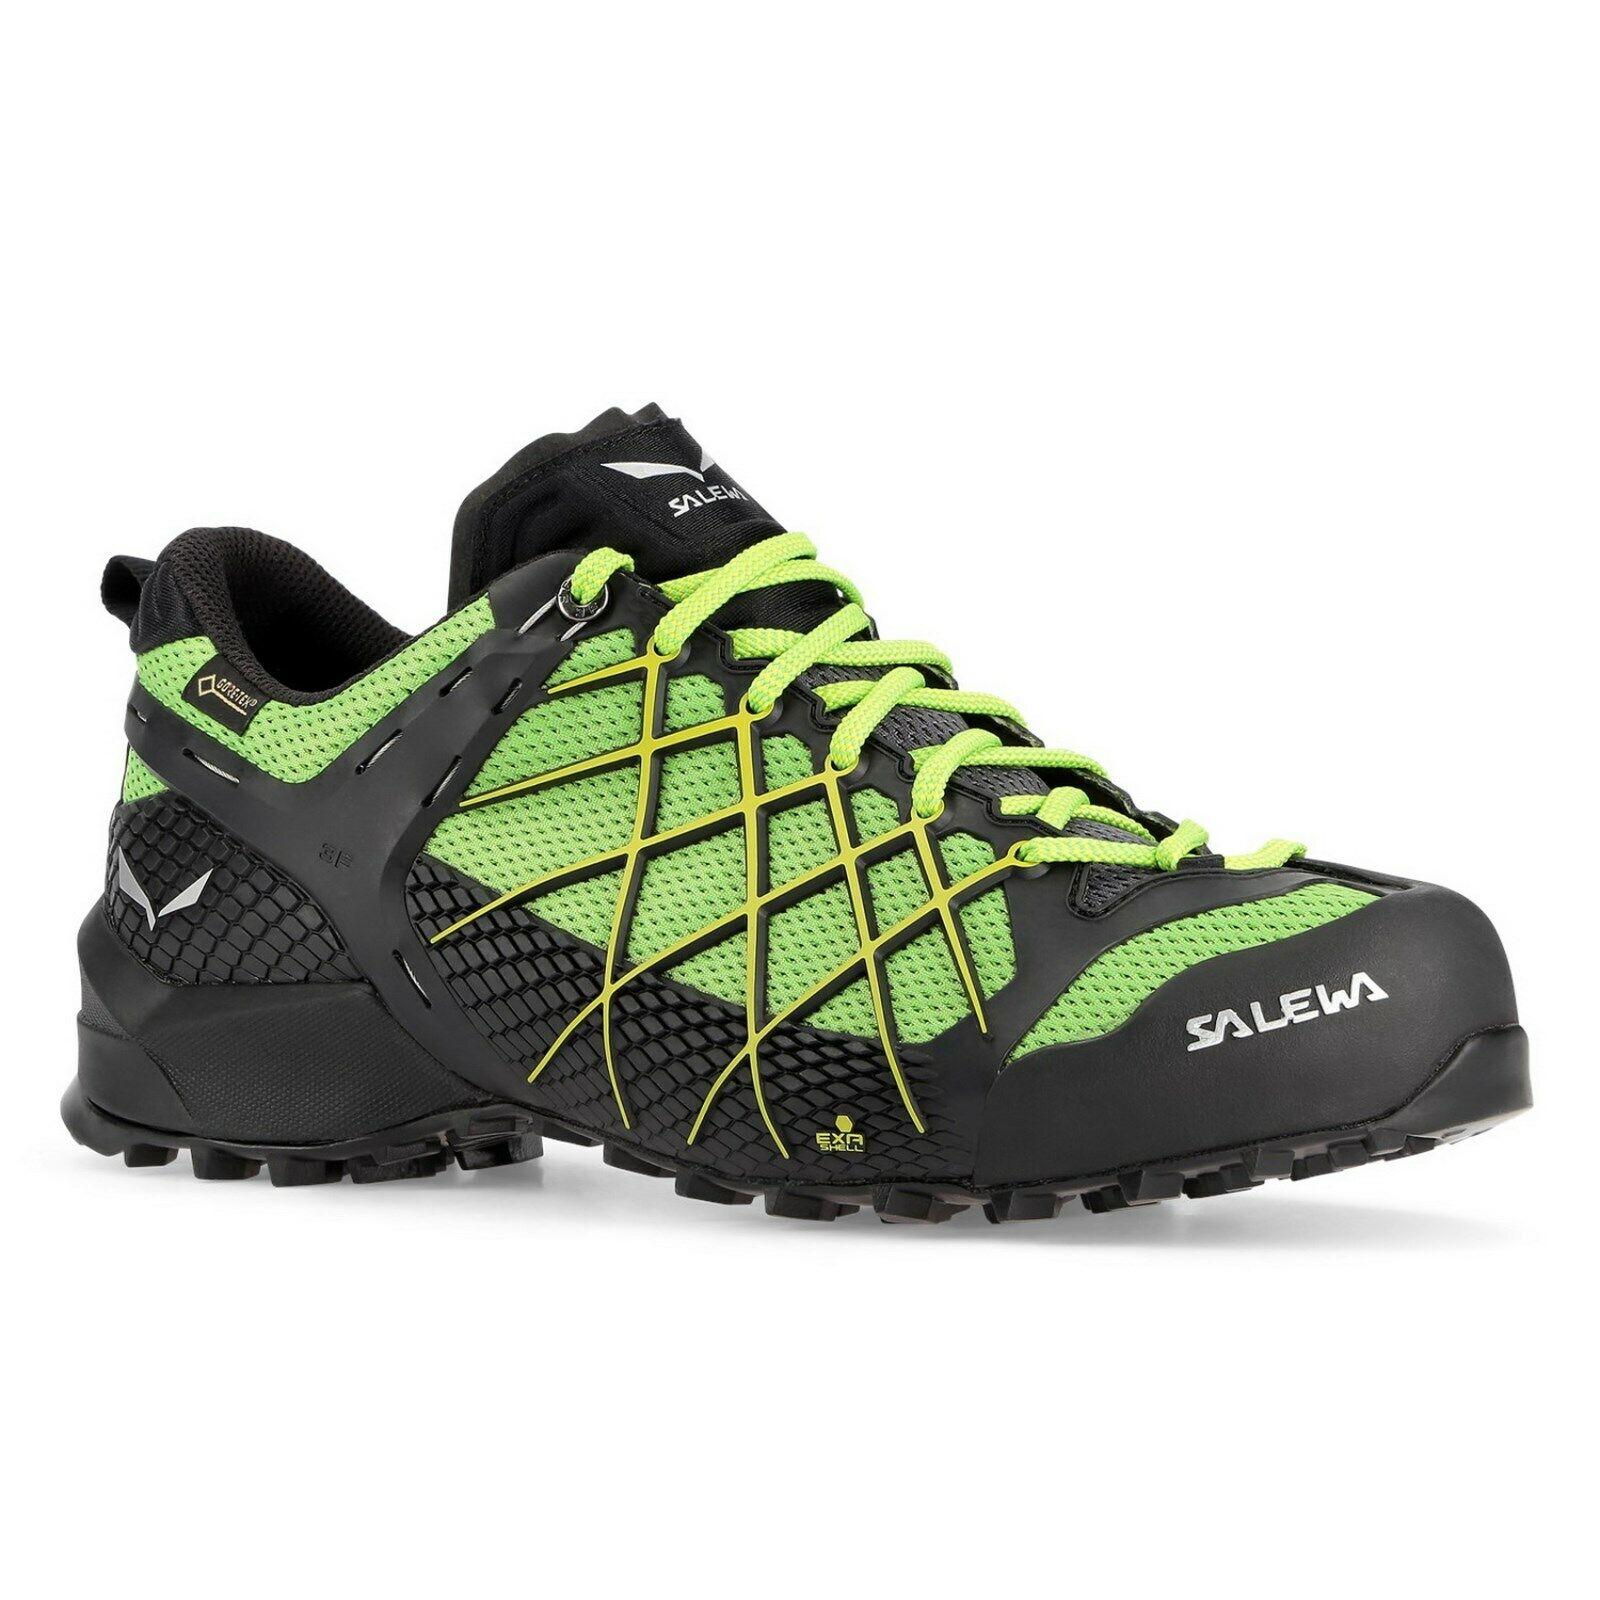 Salewa señores estancos trekking zapatos Wildfire GTX Man Salewa  nuevo